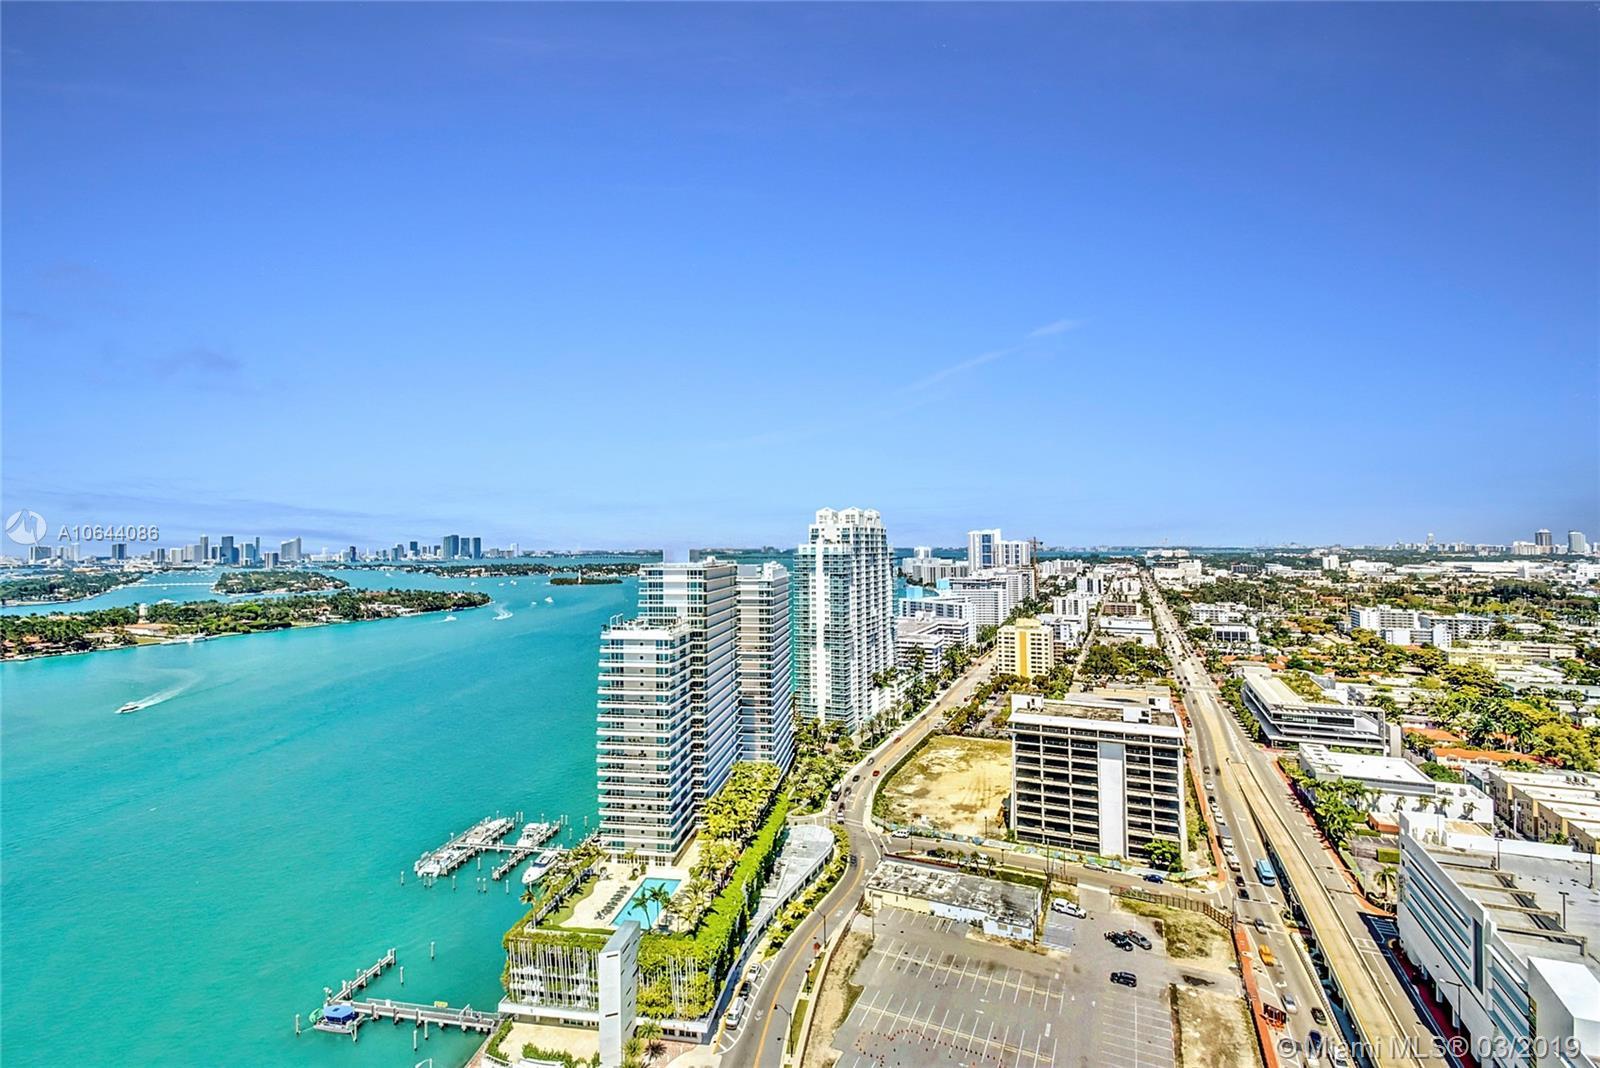 ICON South Beach image #4